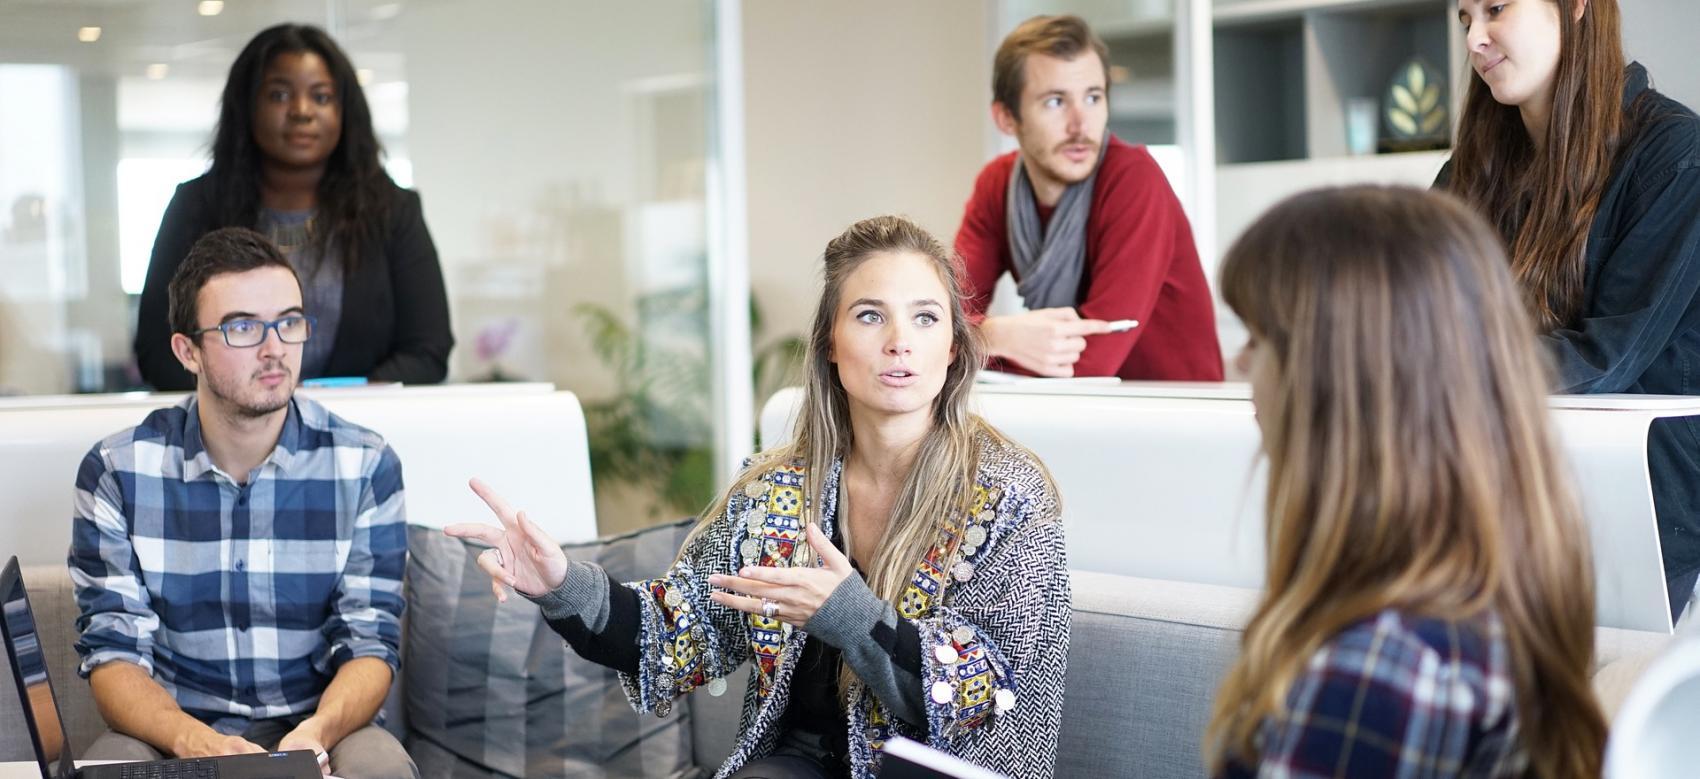 Ayudas e incentivos para el empleo